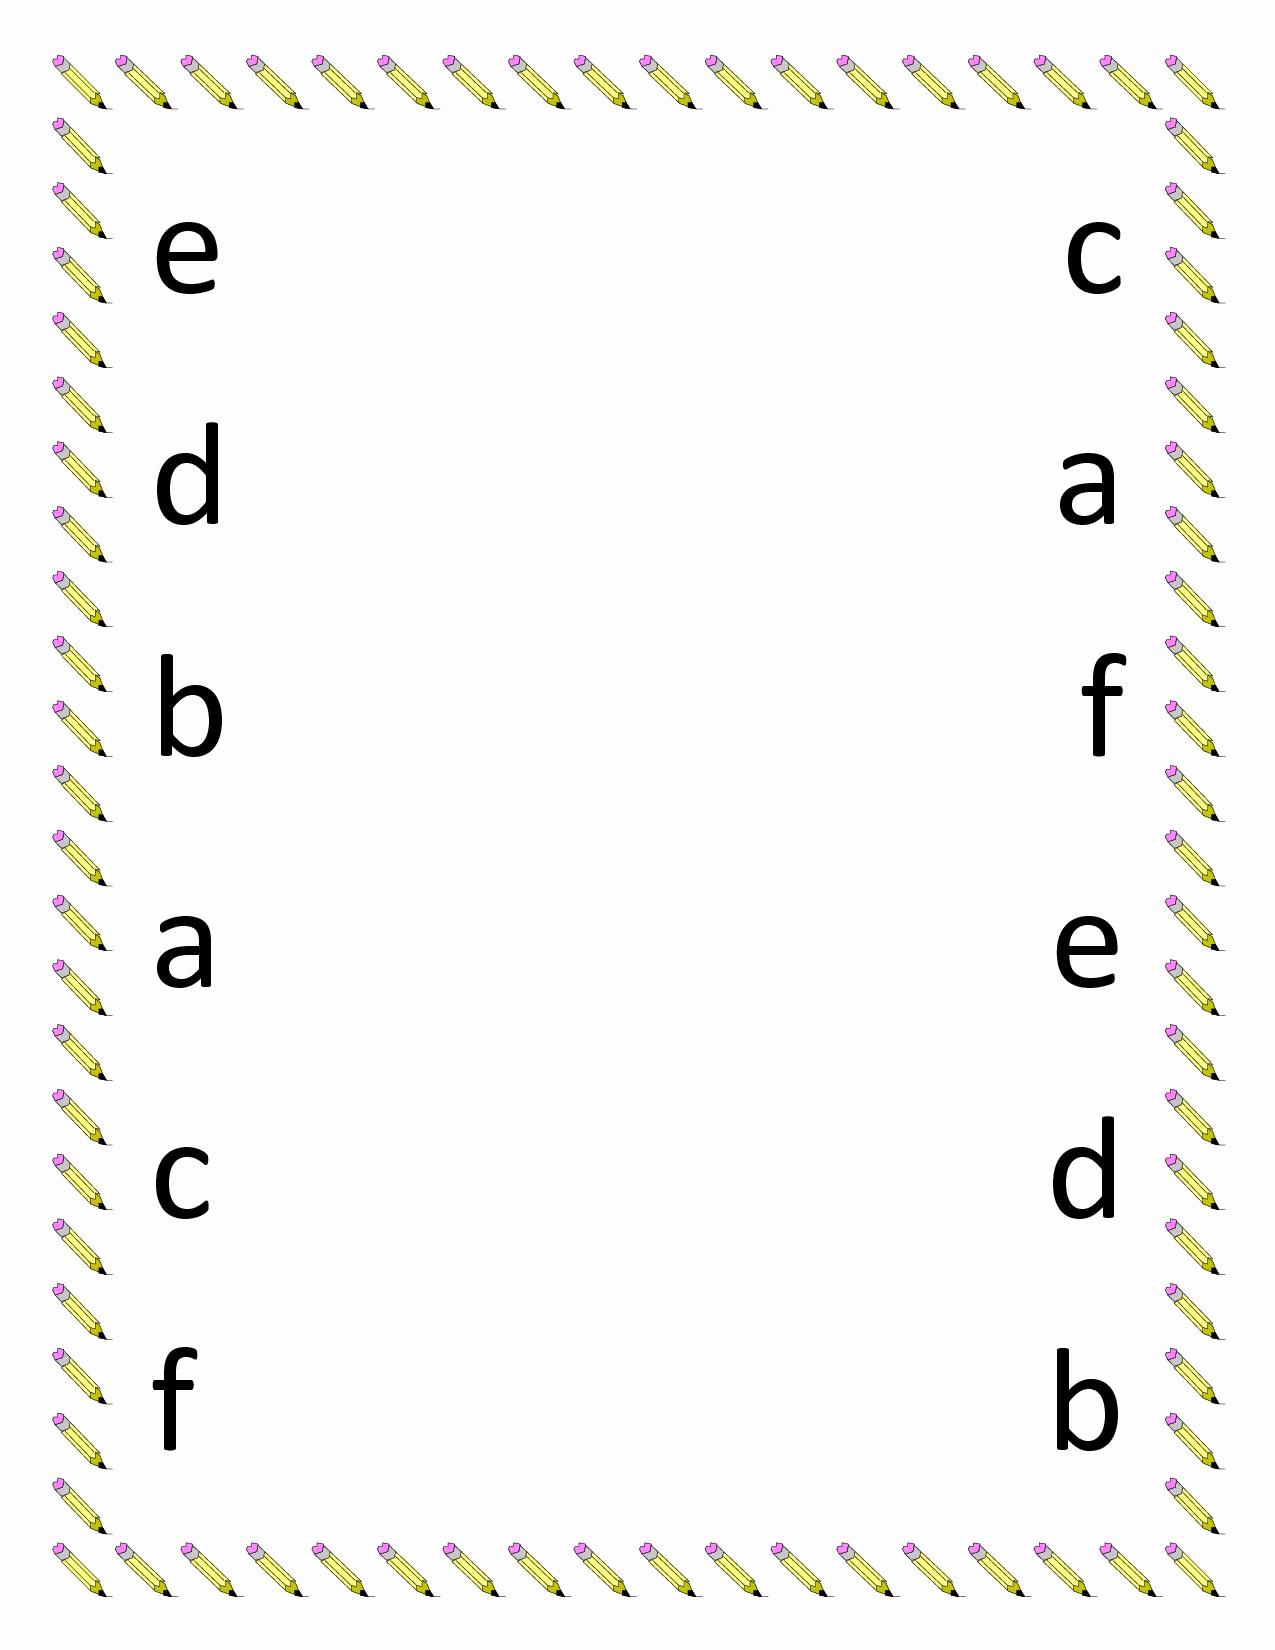 Kindergarten Lowercase Letters Worksheets Fresh Lowercase Abc Practice Sheets – Letter Worksheets